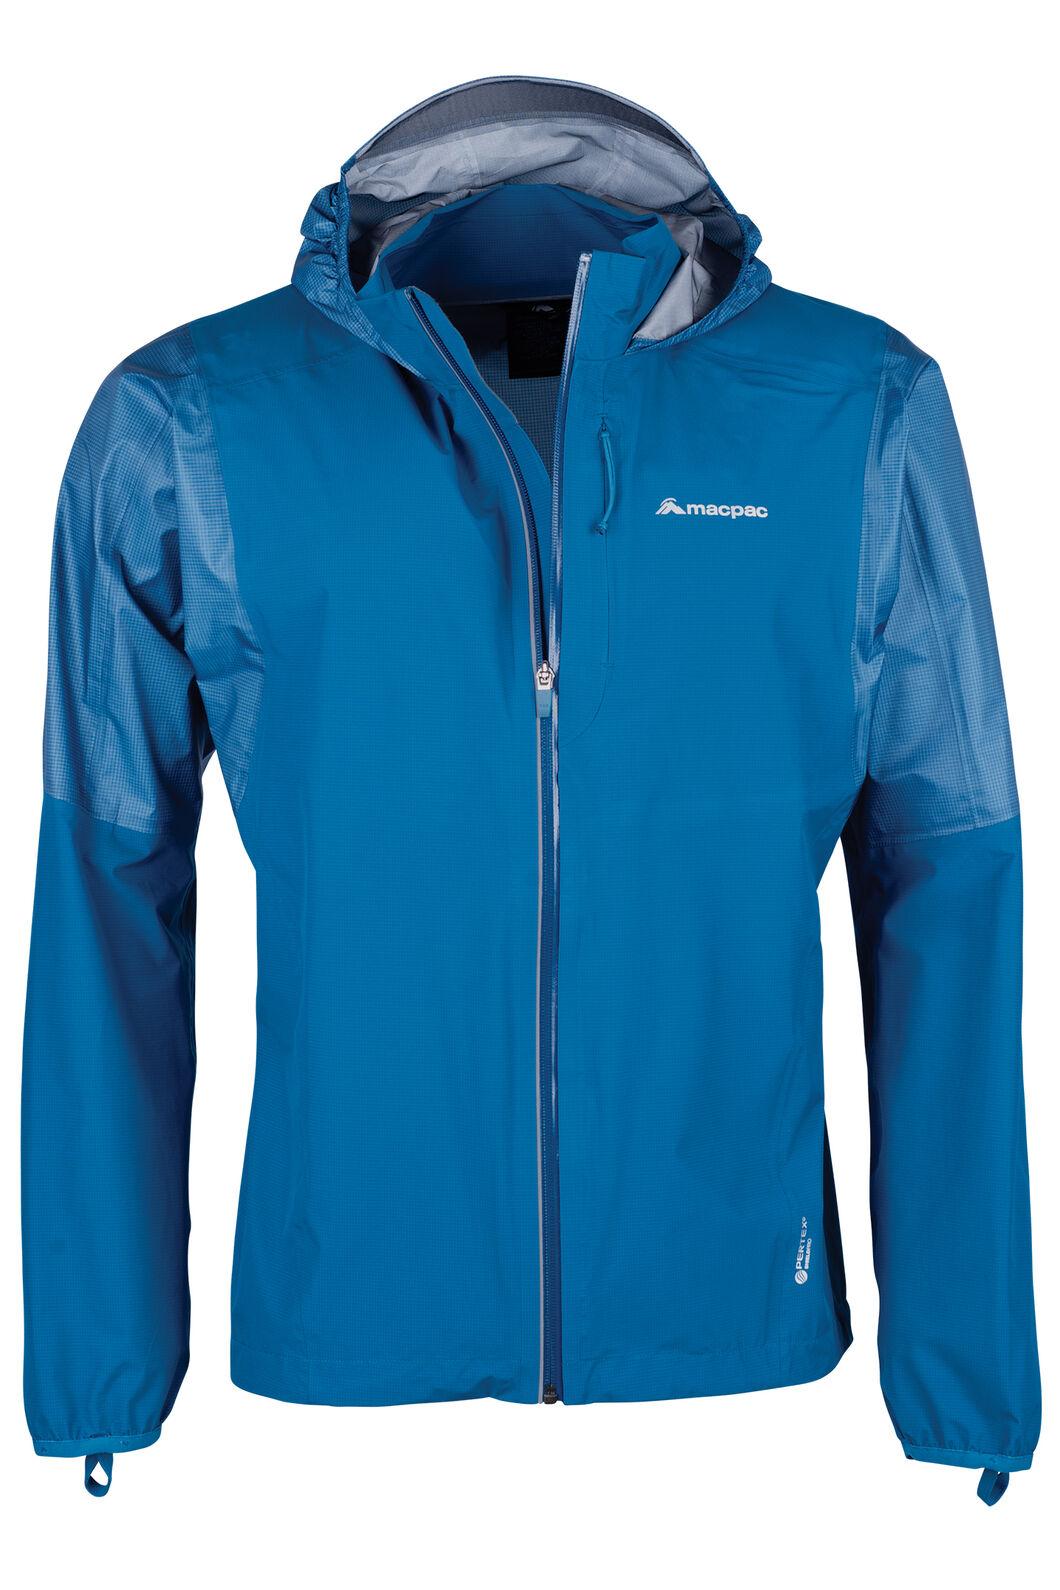 Macpac Transition Pertex® Rain Jacket - Men's, Sapphire, hi-res